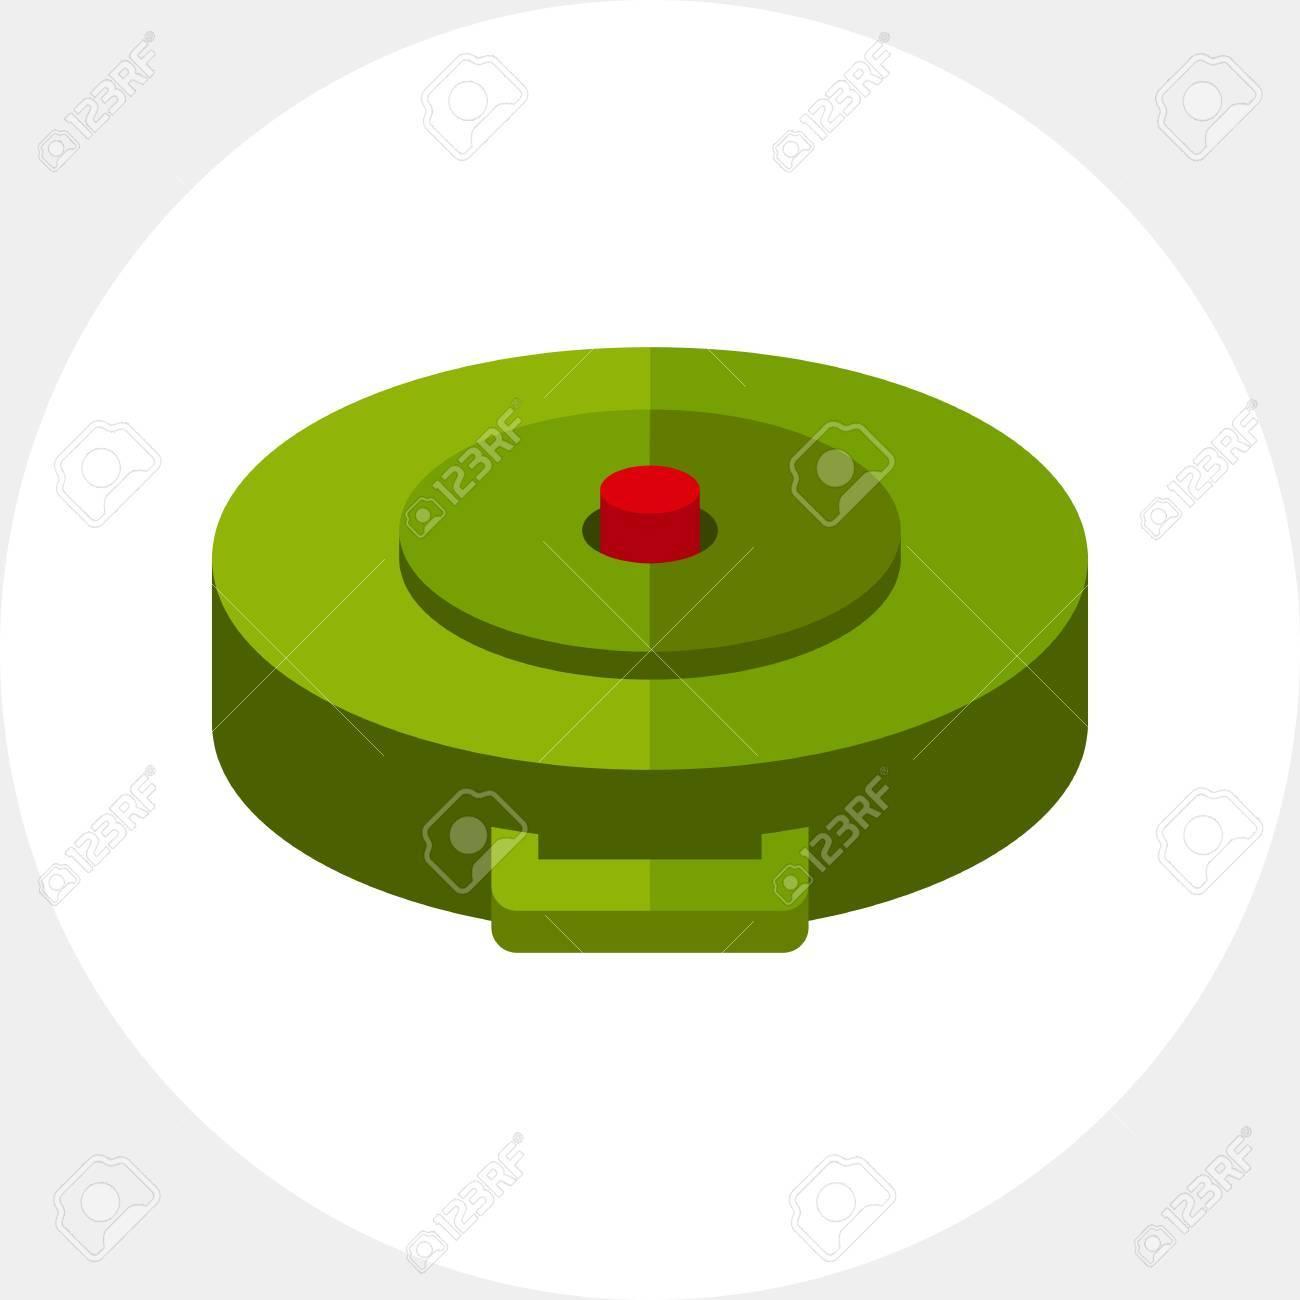 Landmine clipart clip art library download Landmine clipart 4 » Clipart Portal clip art library download